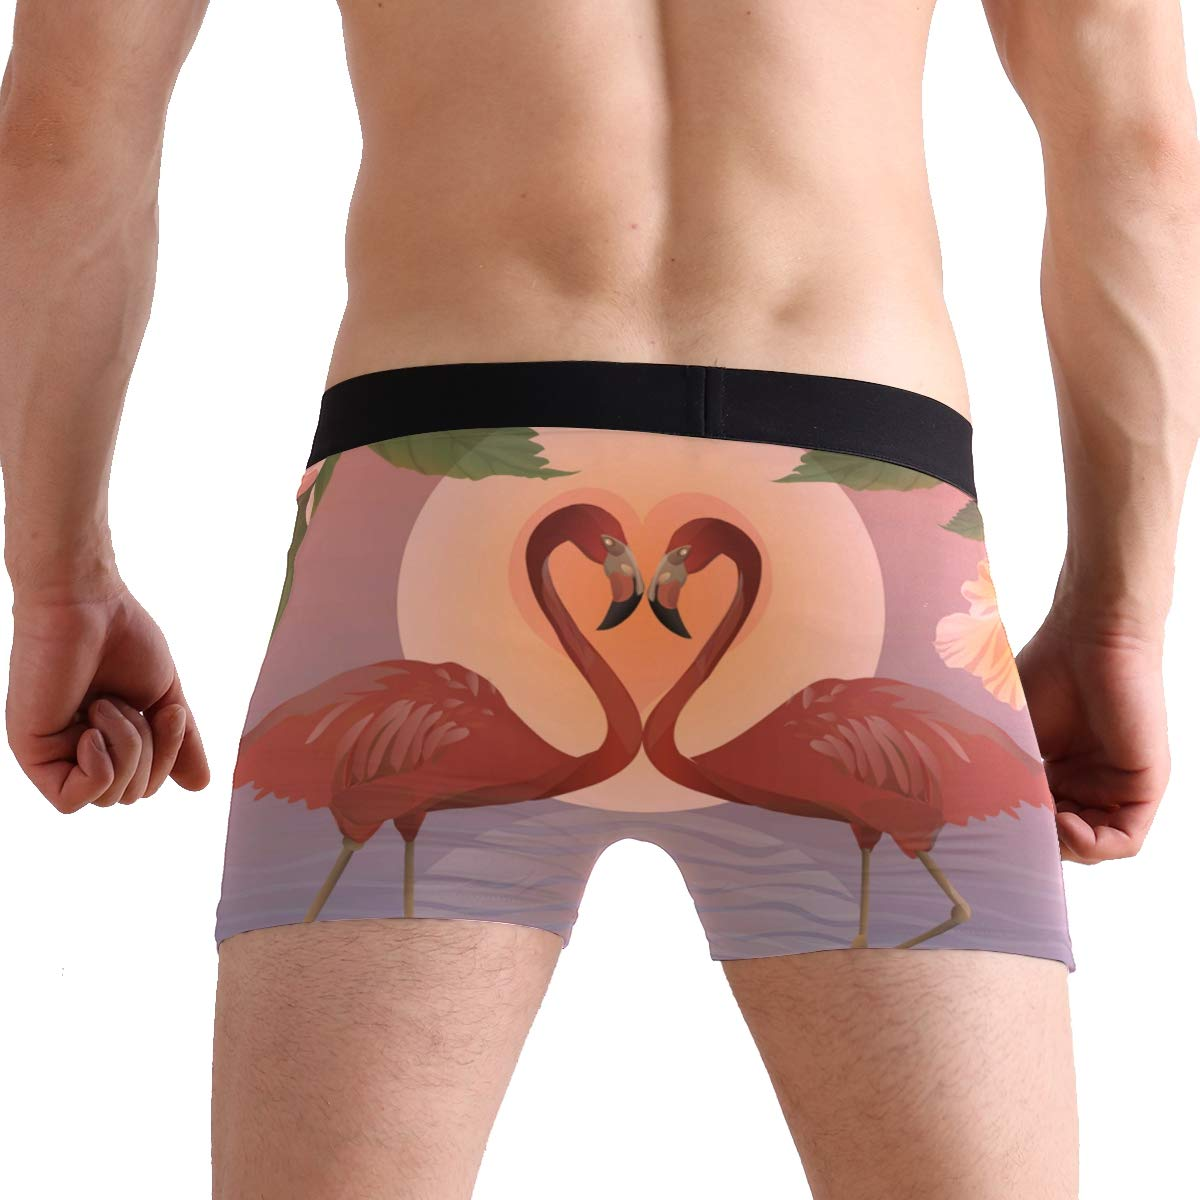 Men Boxer Briefs Polyester Underwear Men 2 Pack Boxer Briefs for Valentines Gift with Romantic Flamingos Pattern